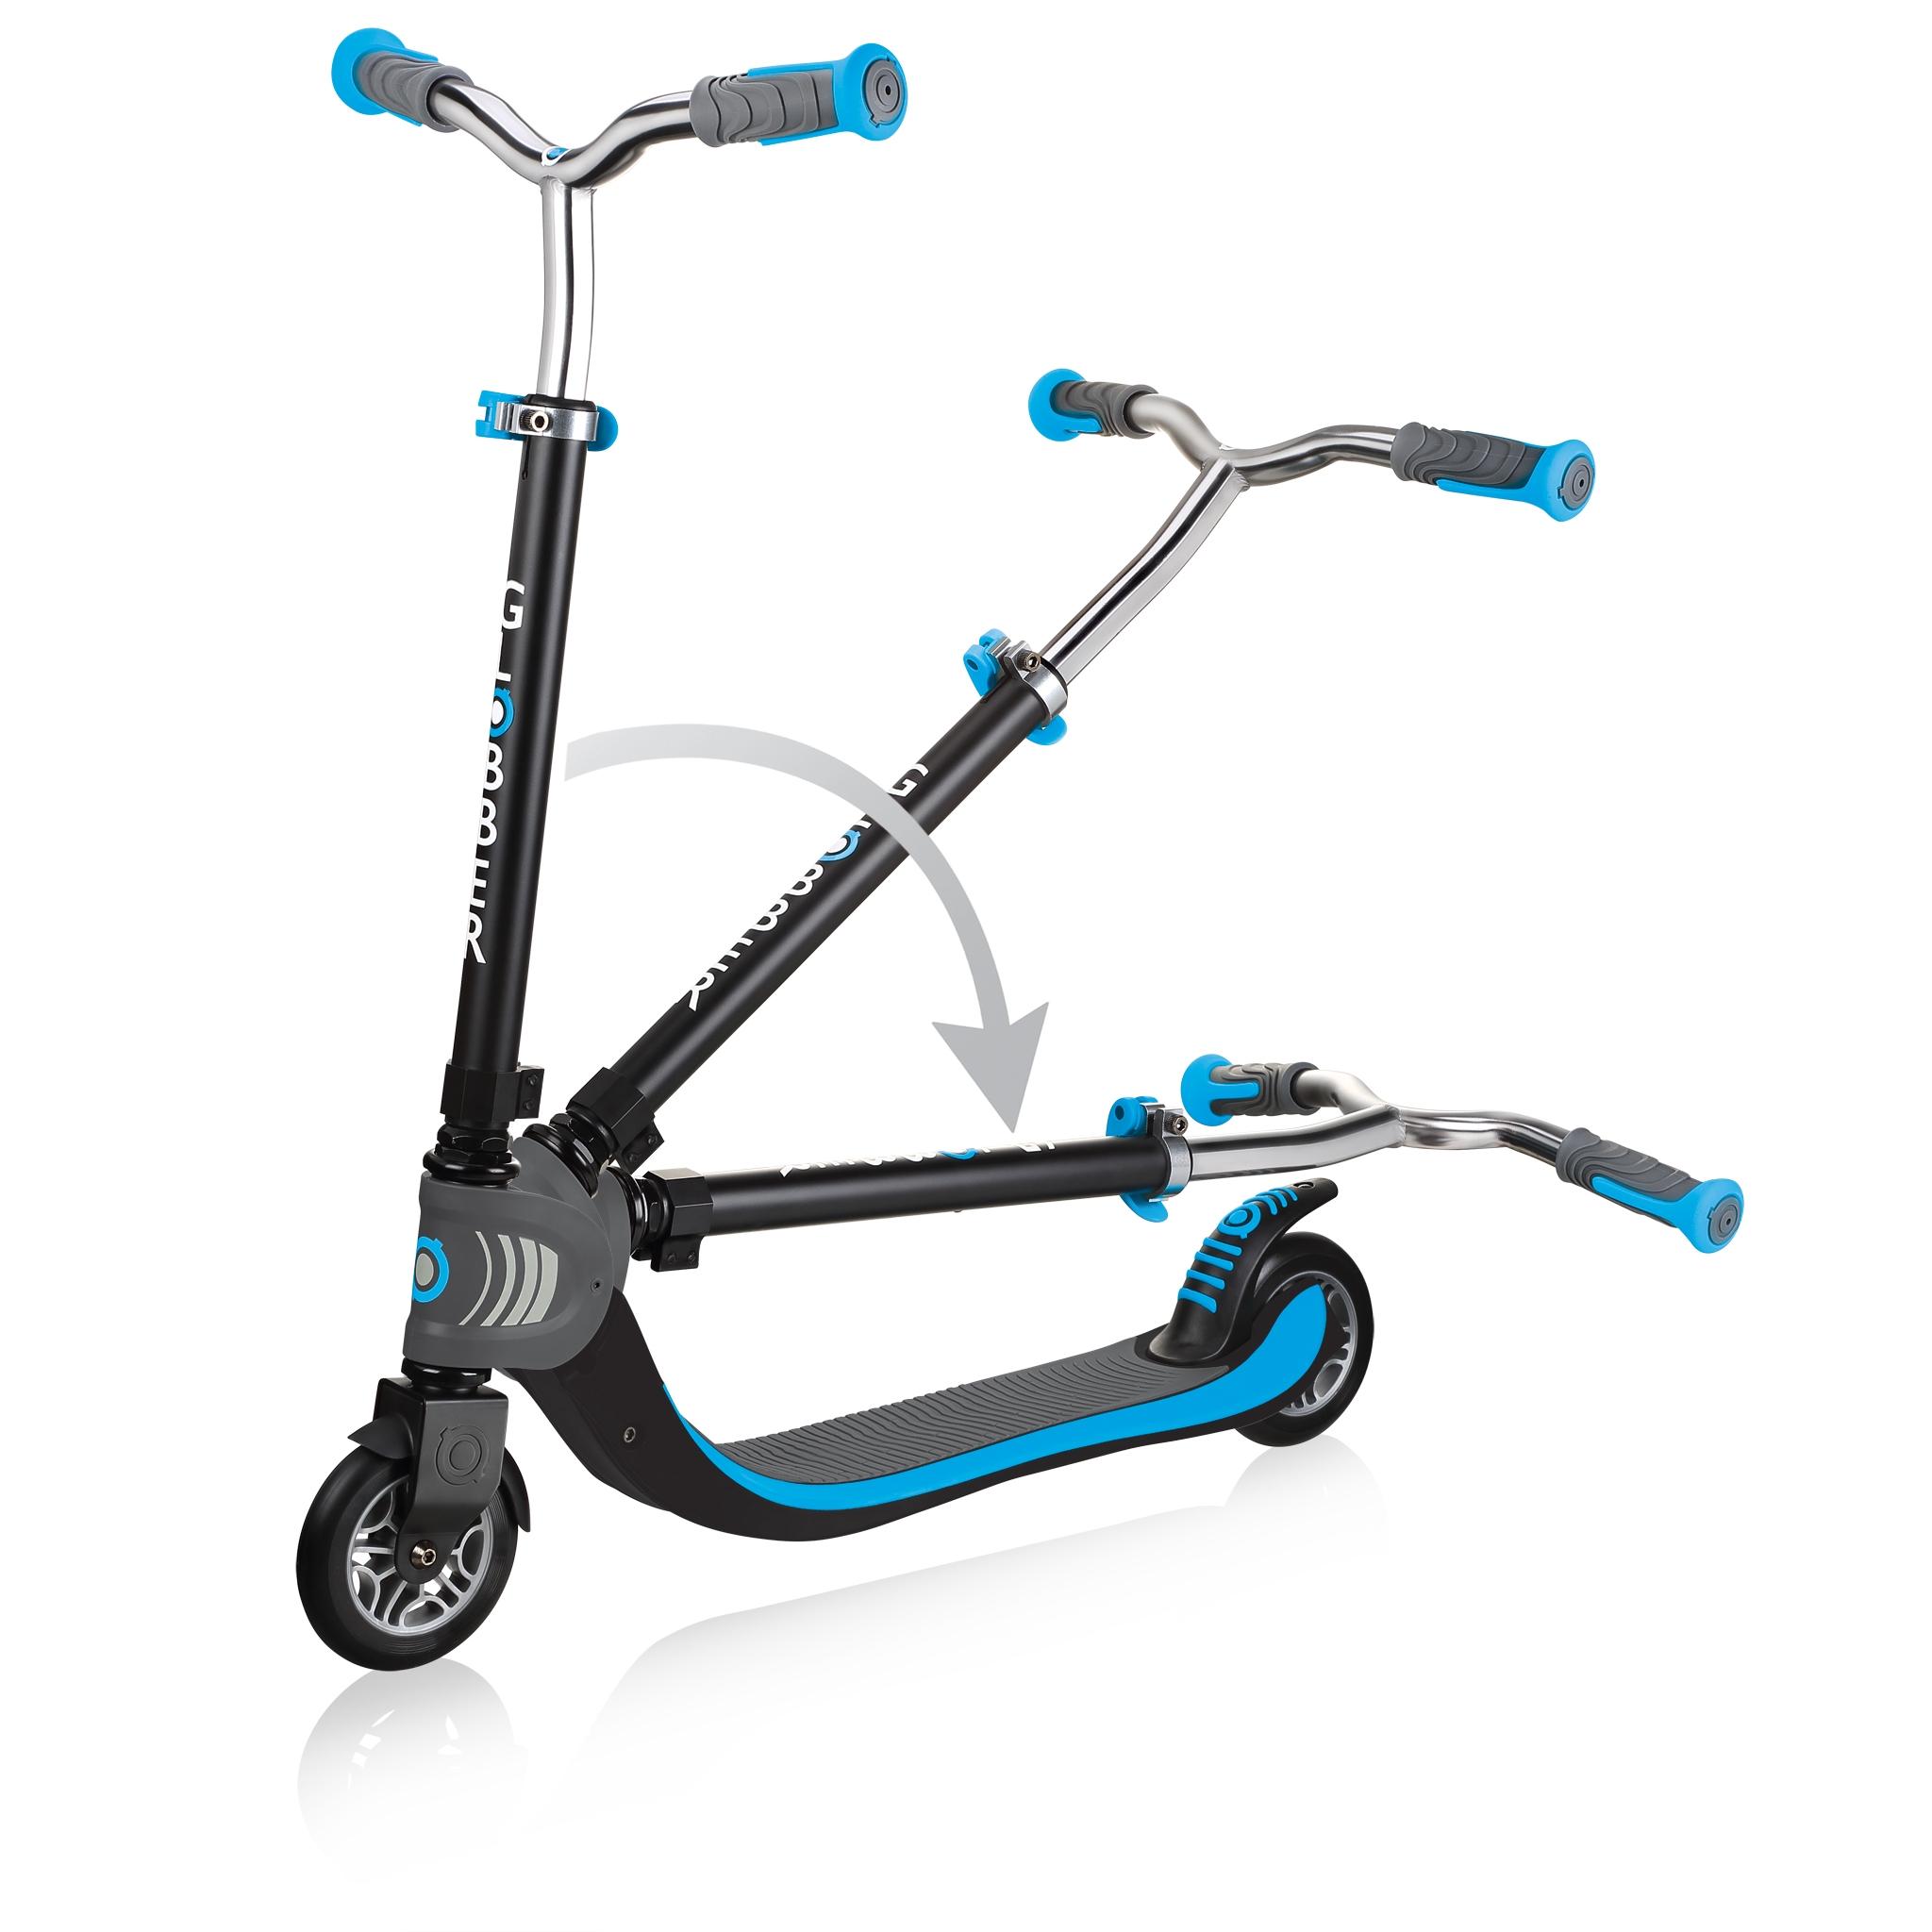 FLOW-FOLDABLE-125-2-wheel-folding-scooter-for-kids-sky-blue